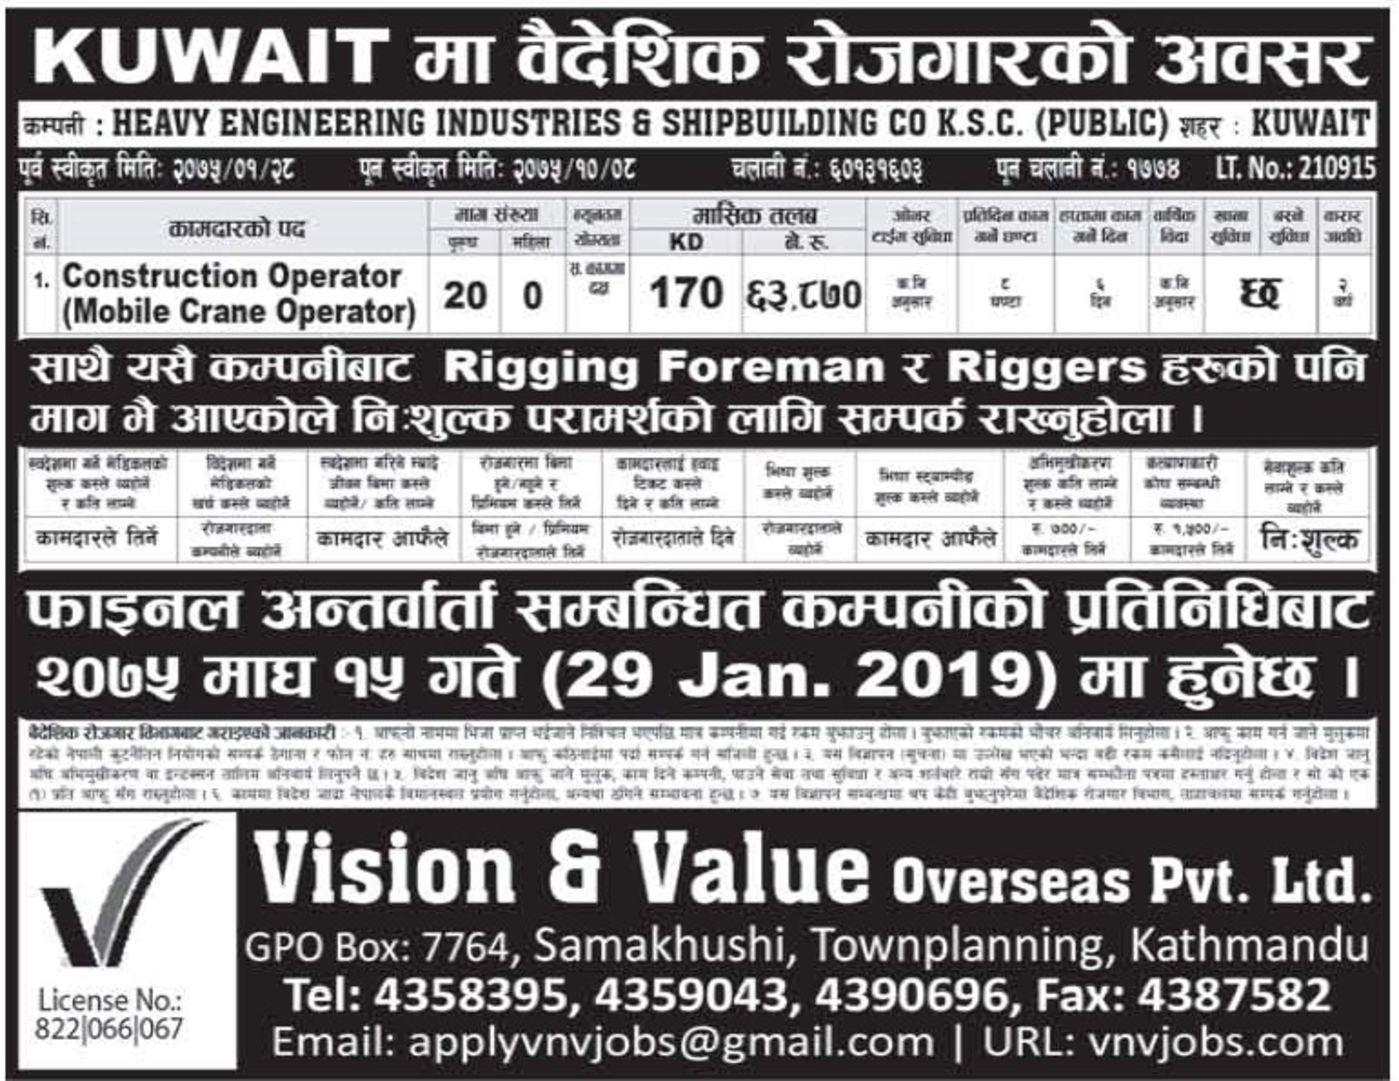 Jobs Nepal - vacancy - Labor - Heavy Engineering Industries